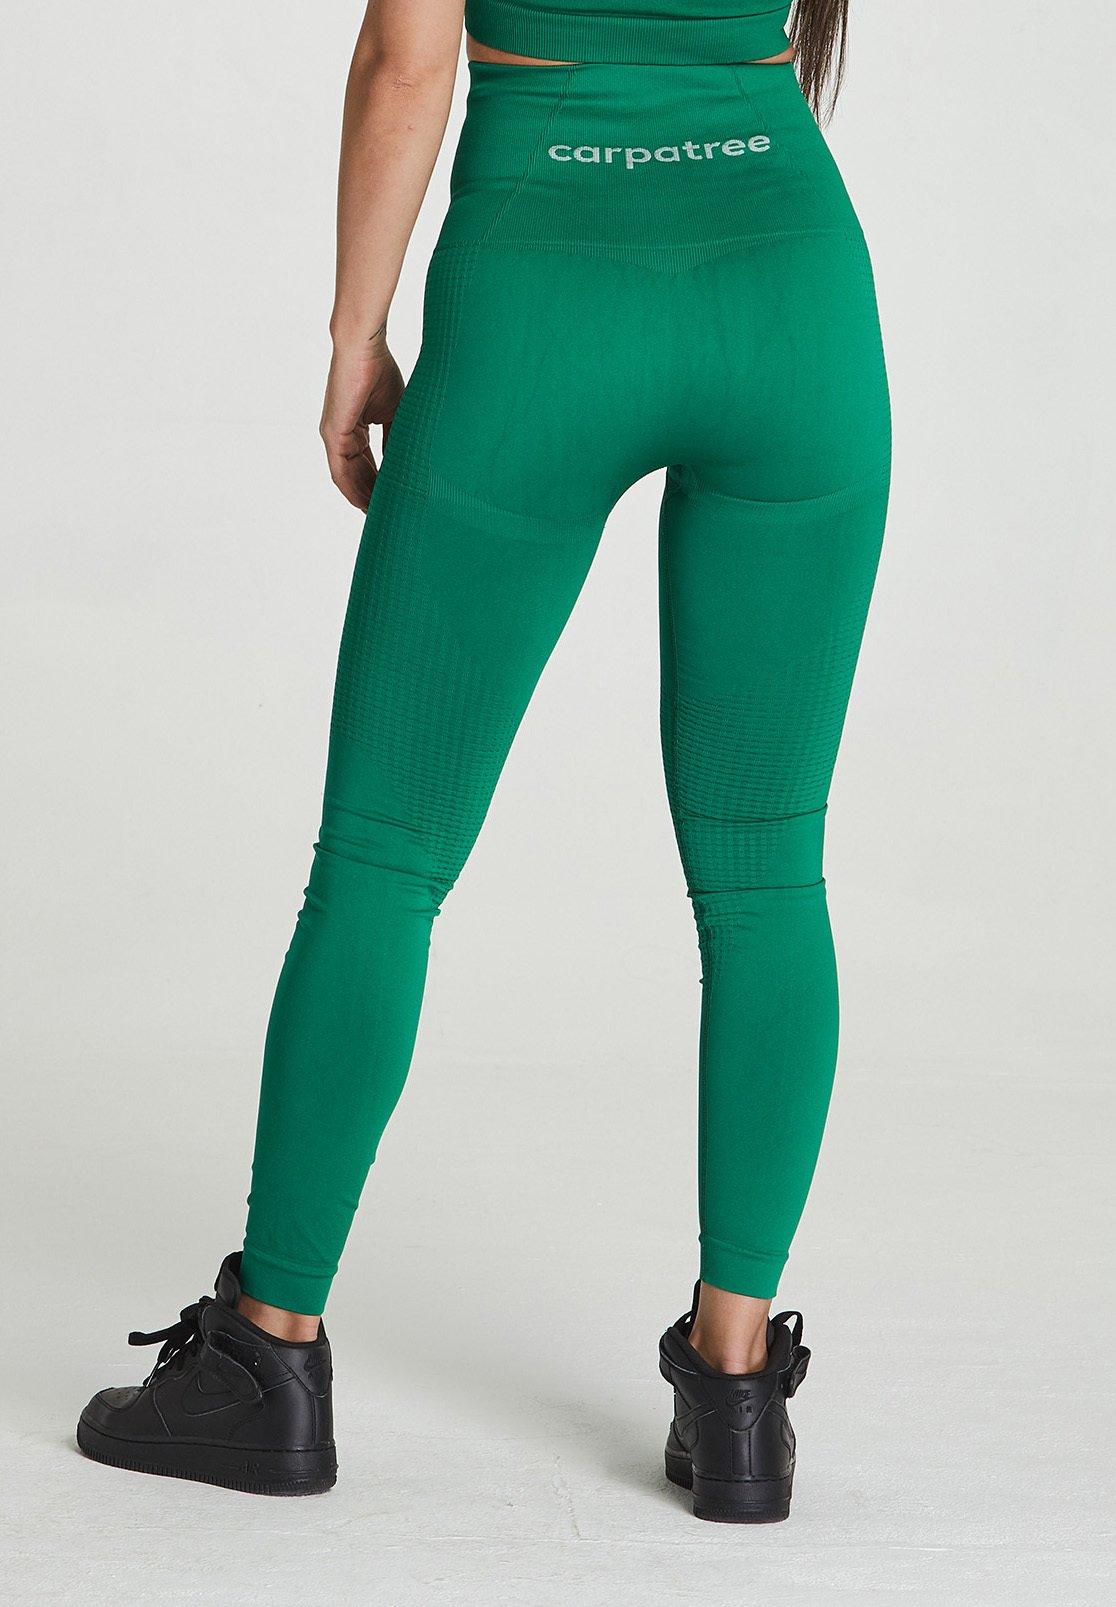 carpatree TIGHTS - Leggings - green lnj6S